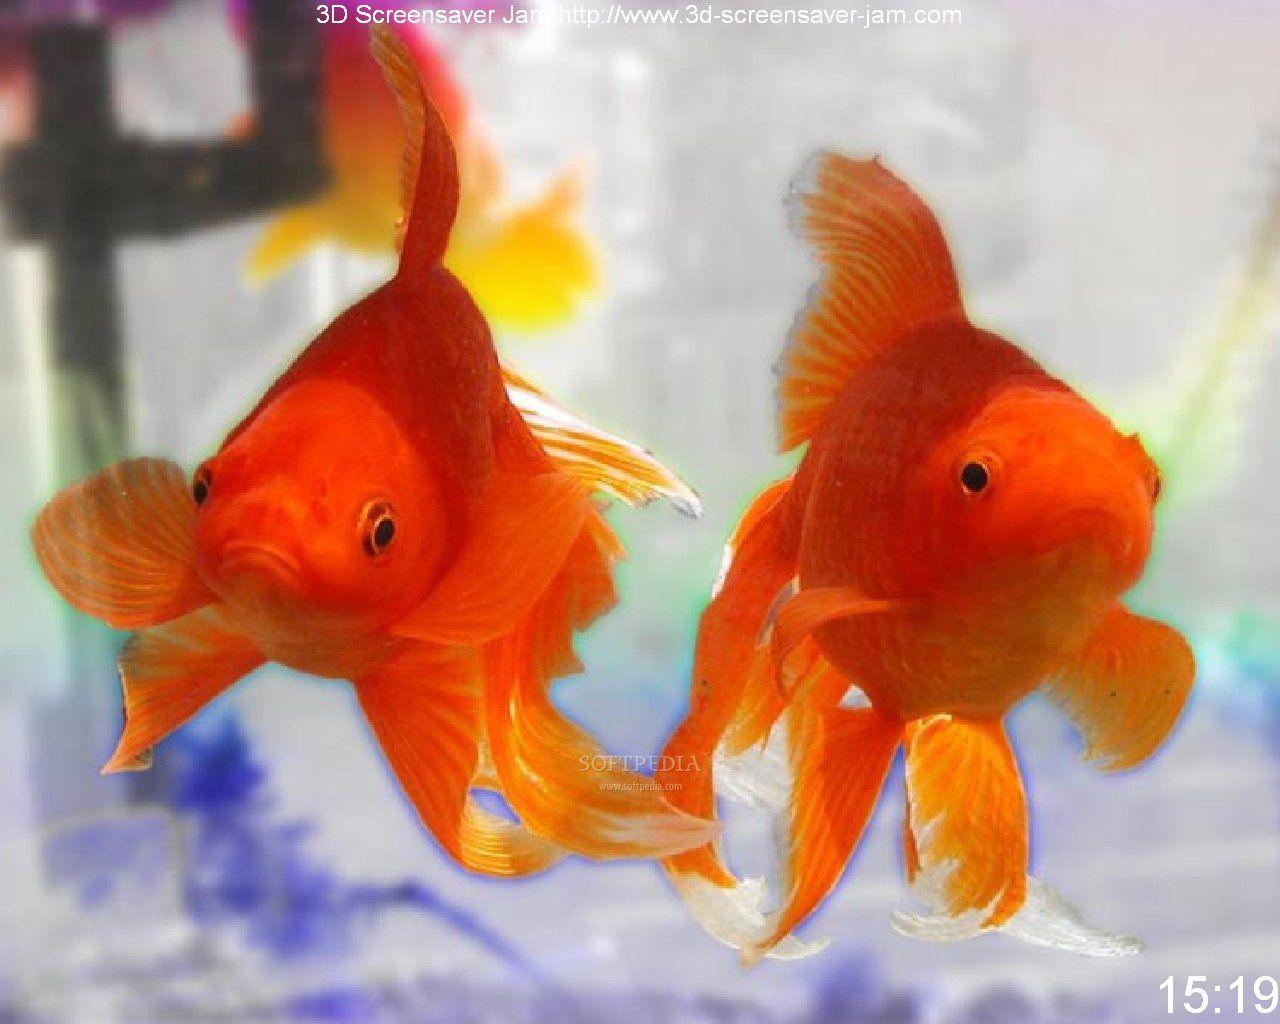 Red comet goldfish - photo#6